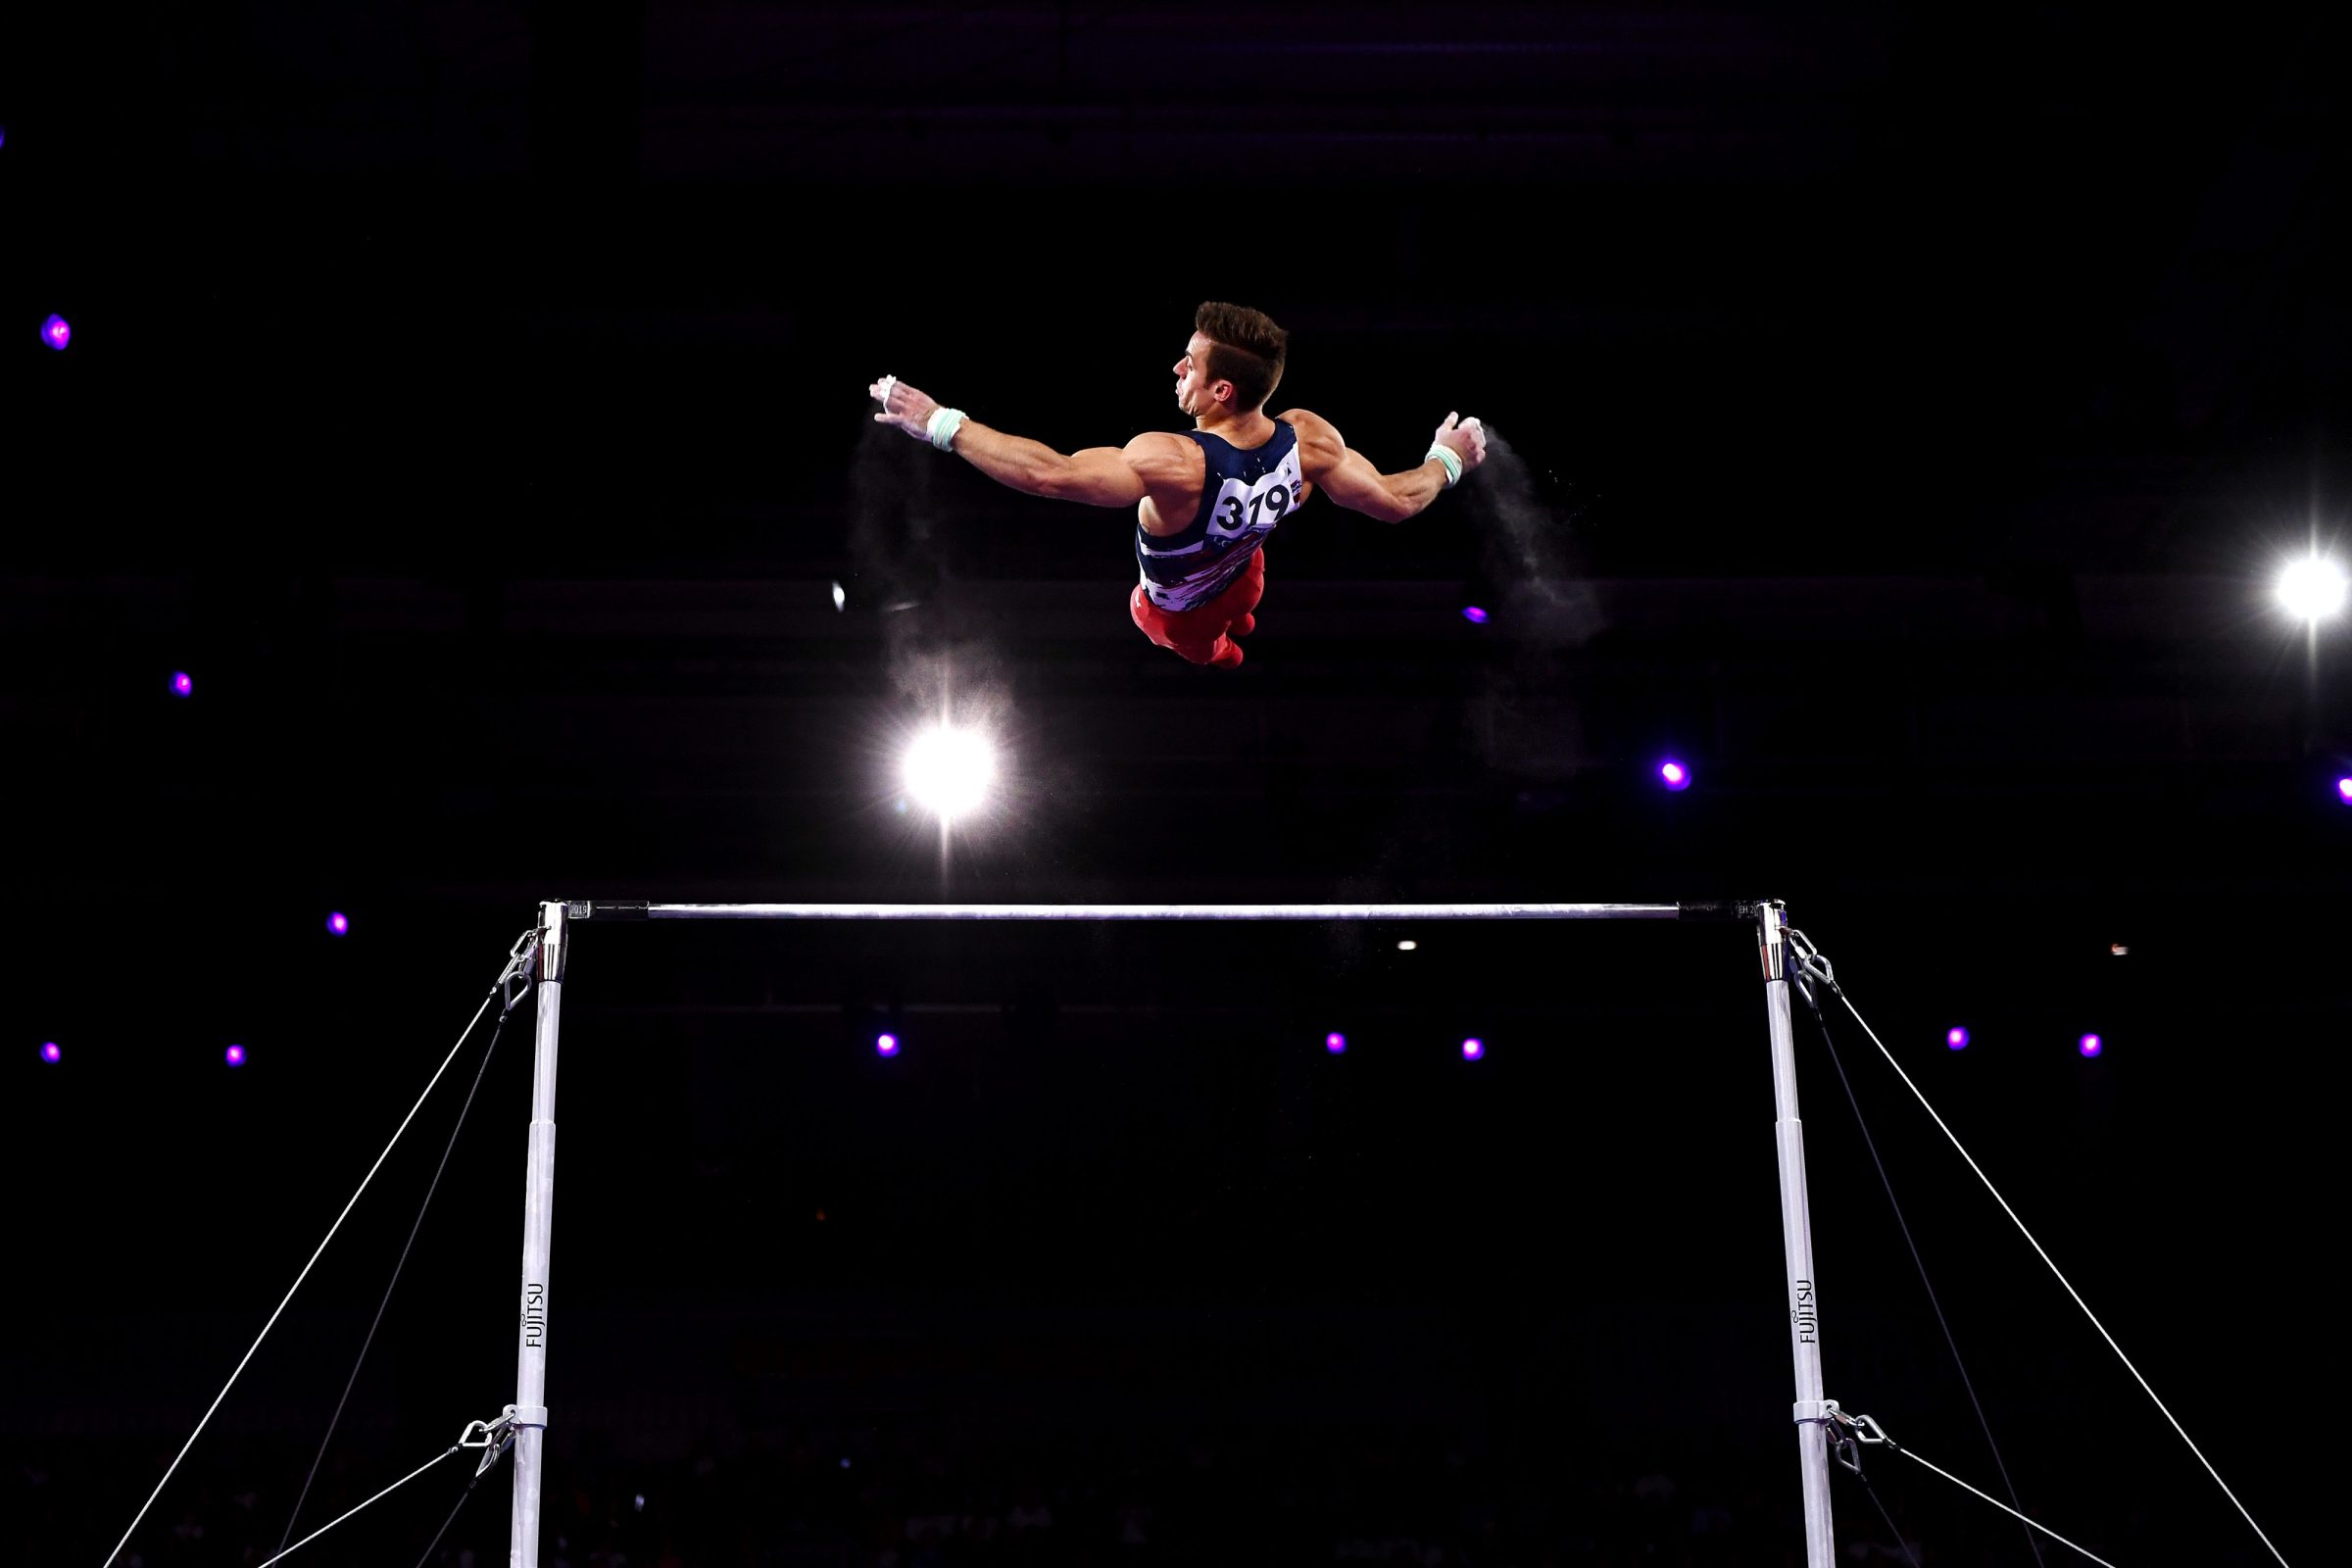 U.S. Gymnast Sam Mikulak, formerly of the University of Michigan, at the 2019 FIG Championships.